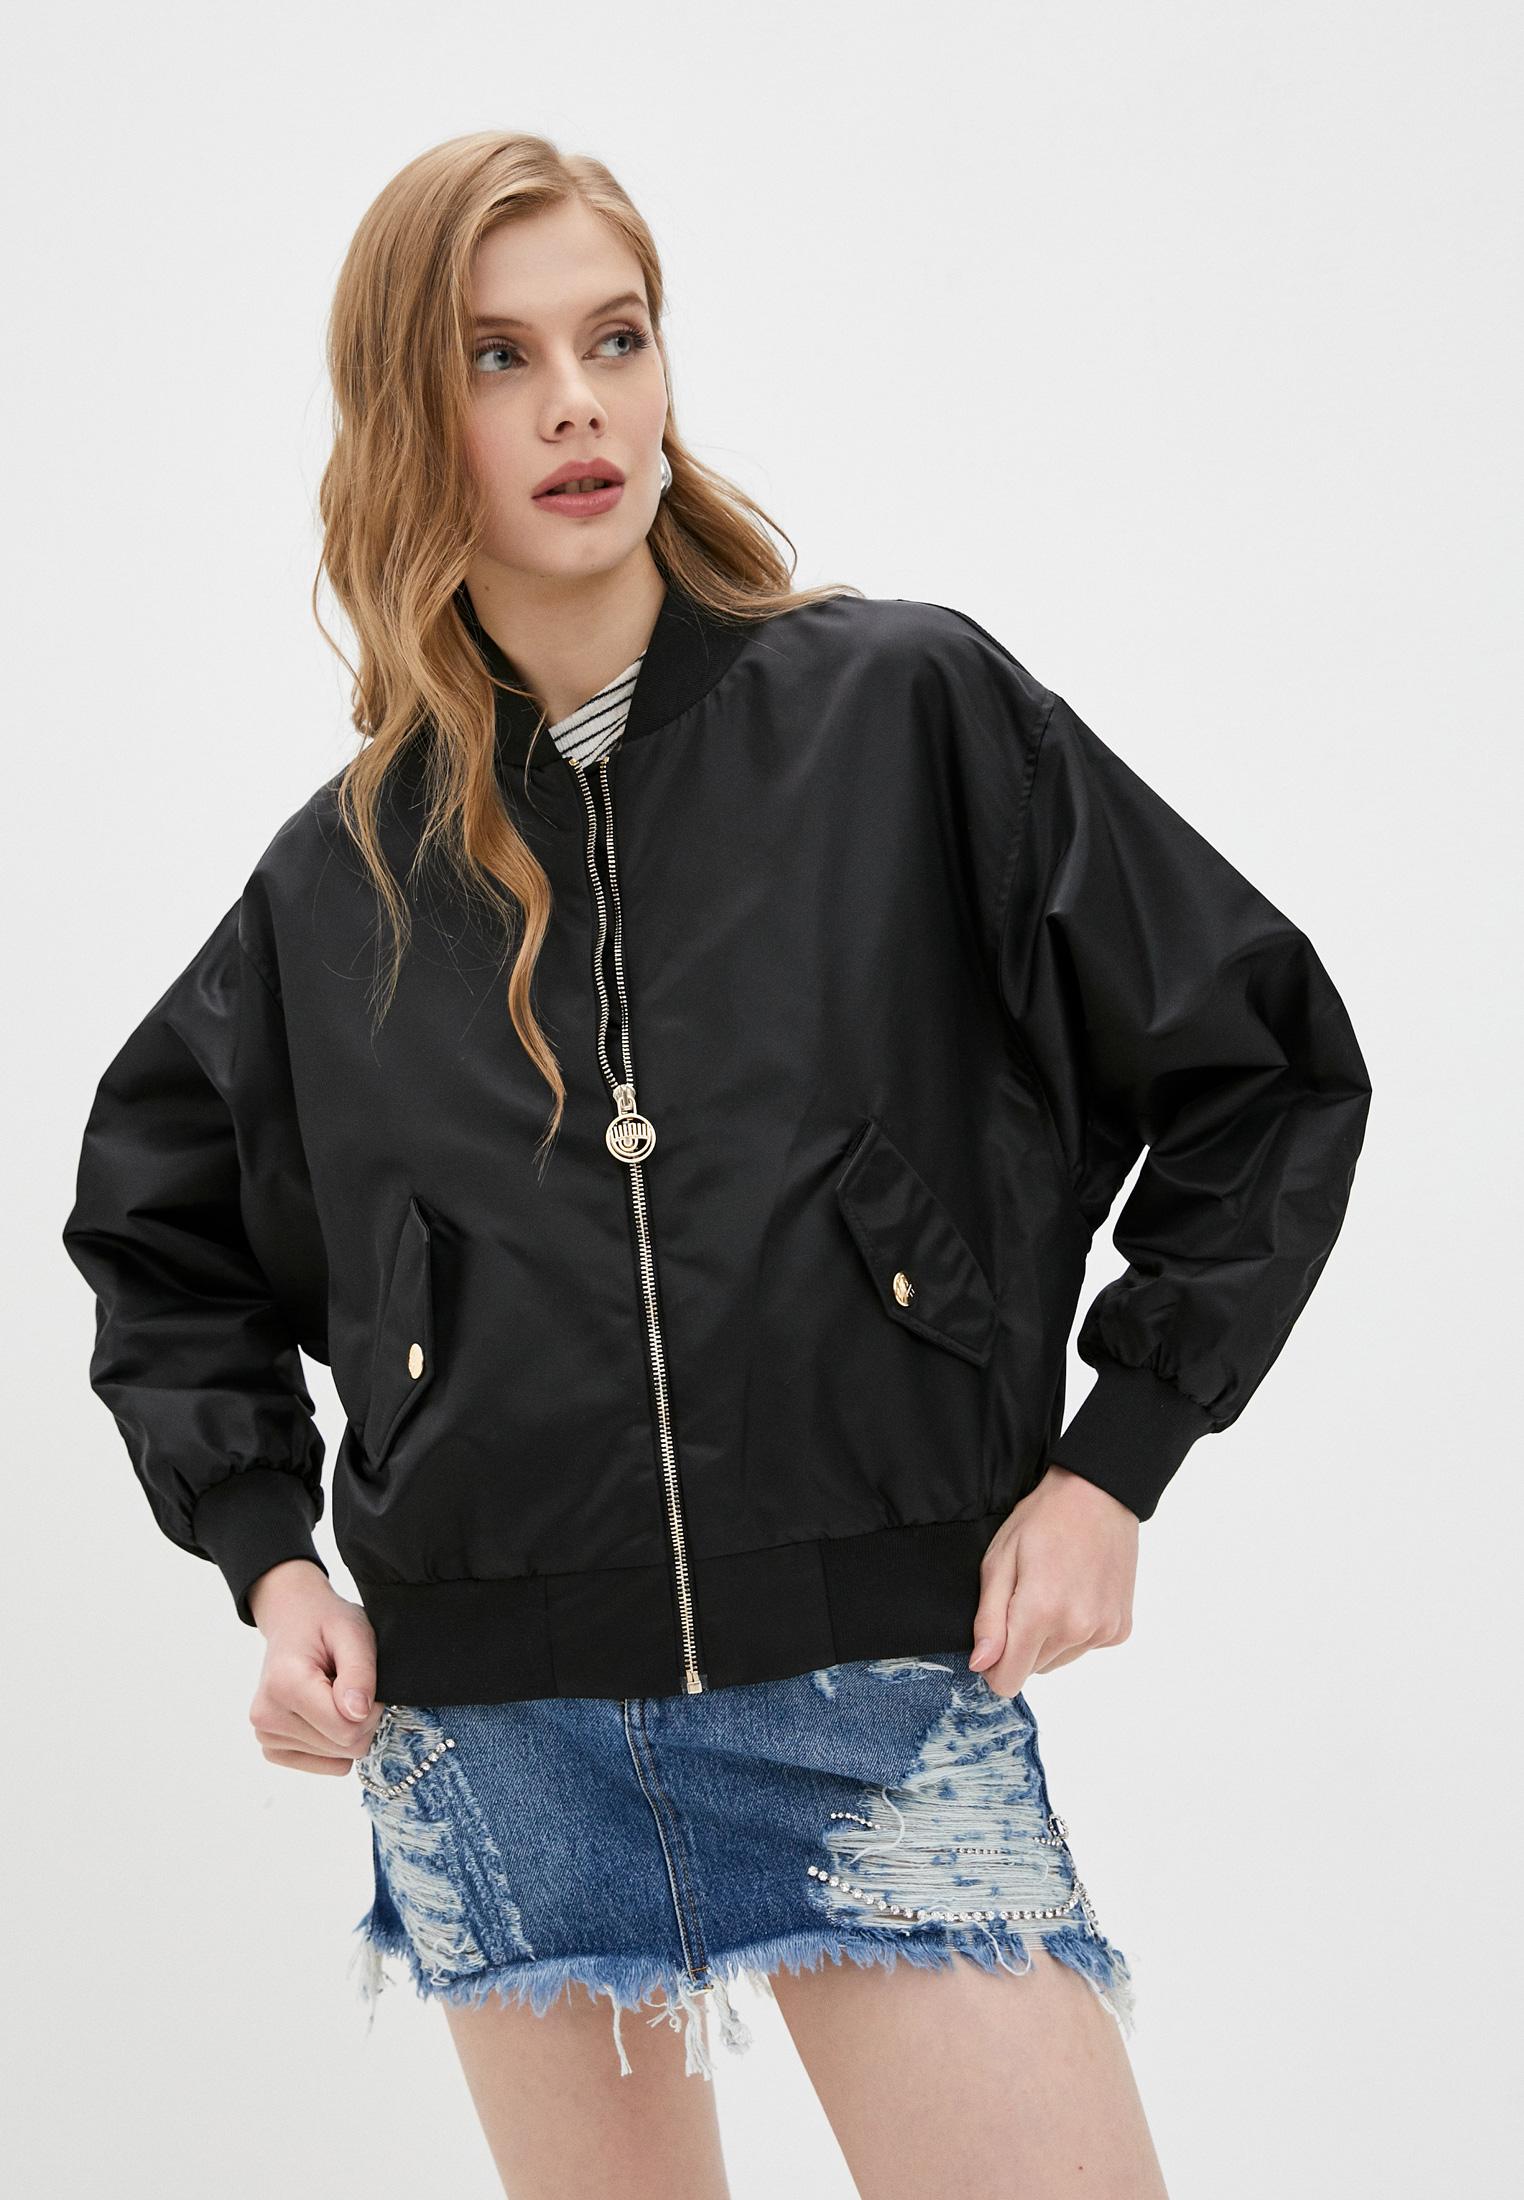 Женская верхняя одежда Chiara Ferragni Куртка Chiara Ferragni